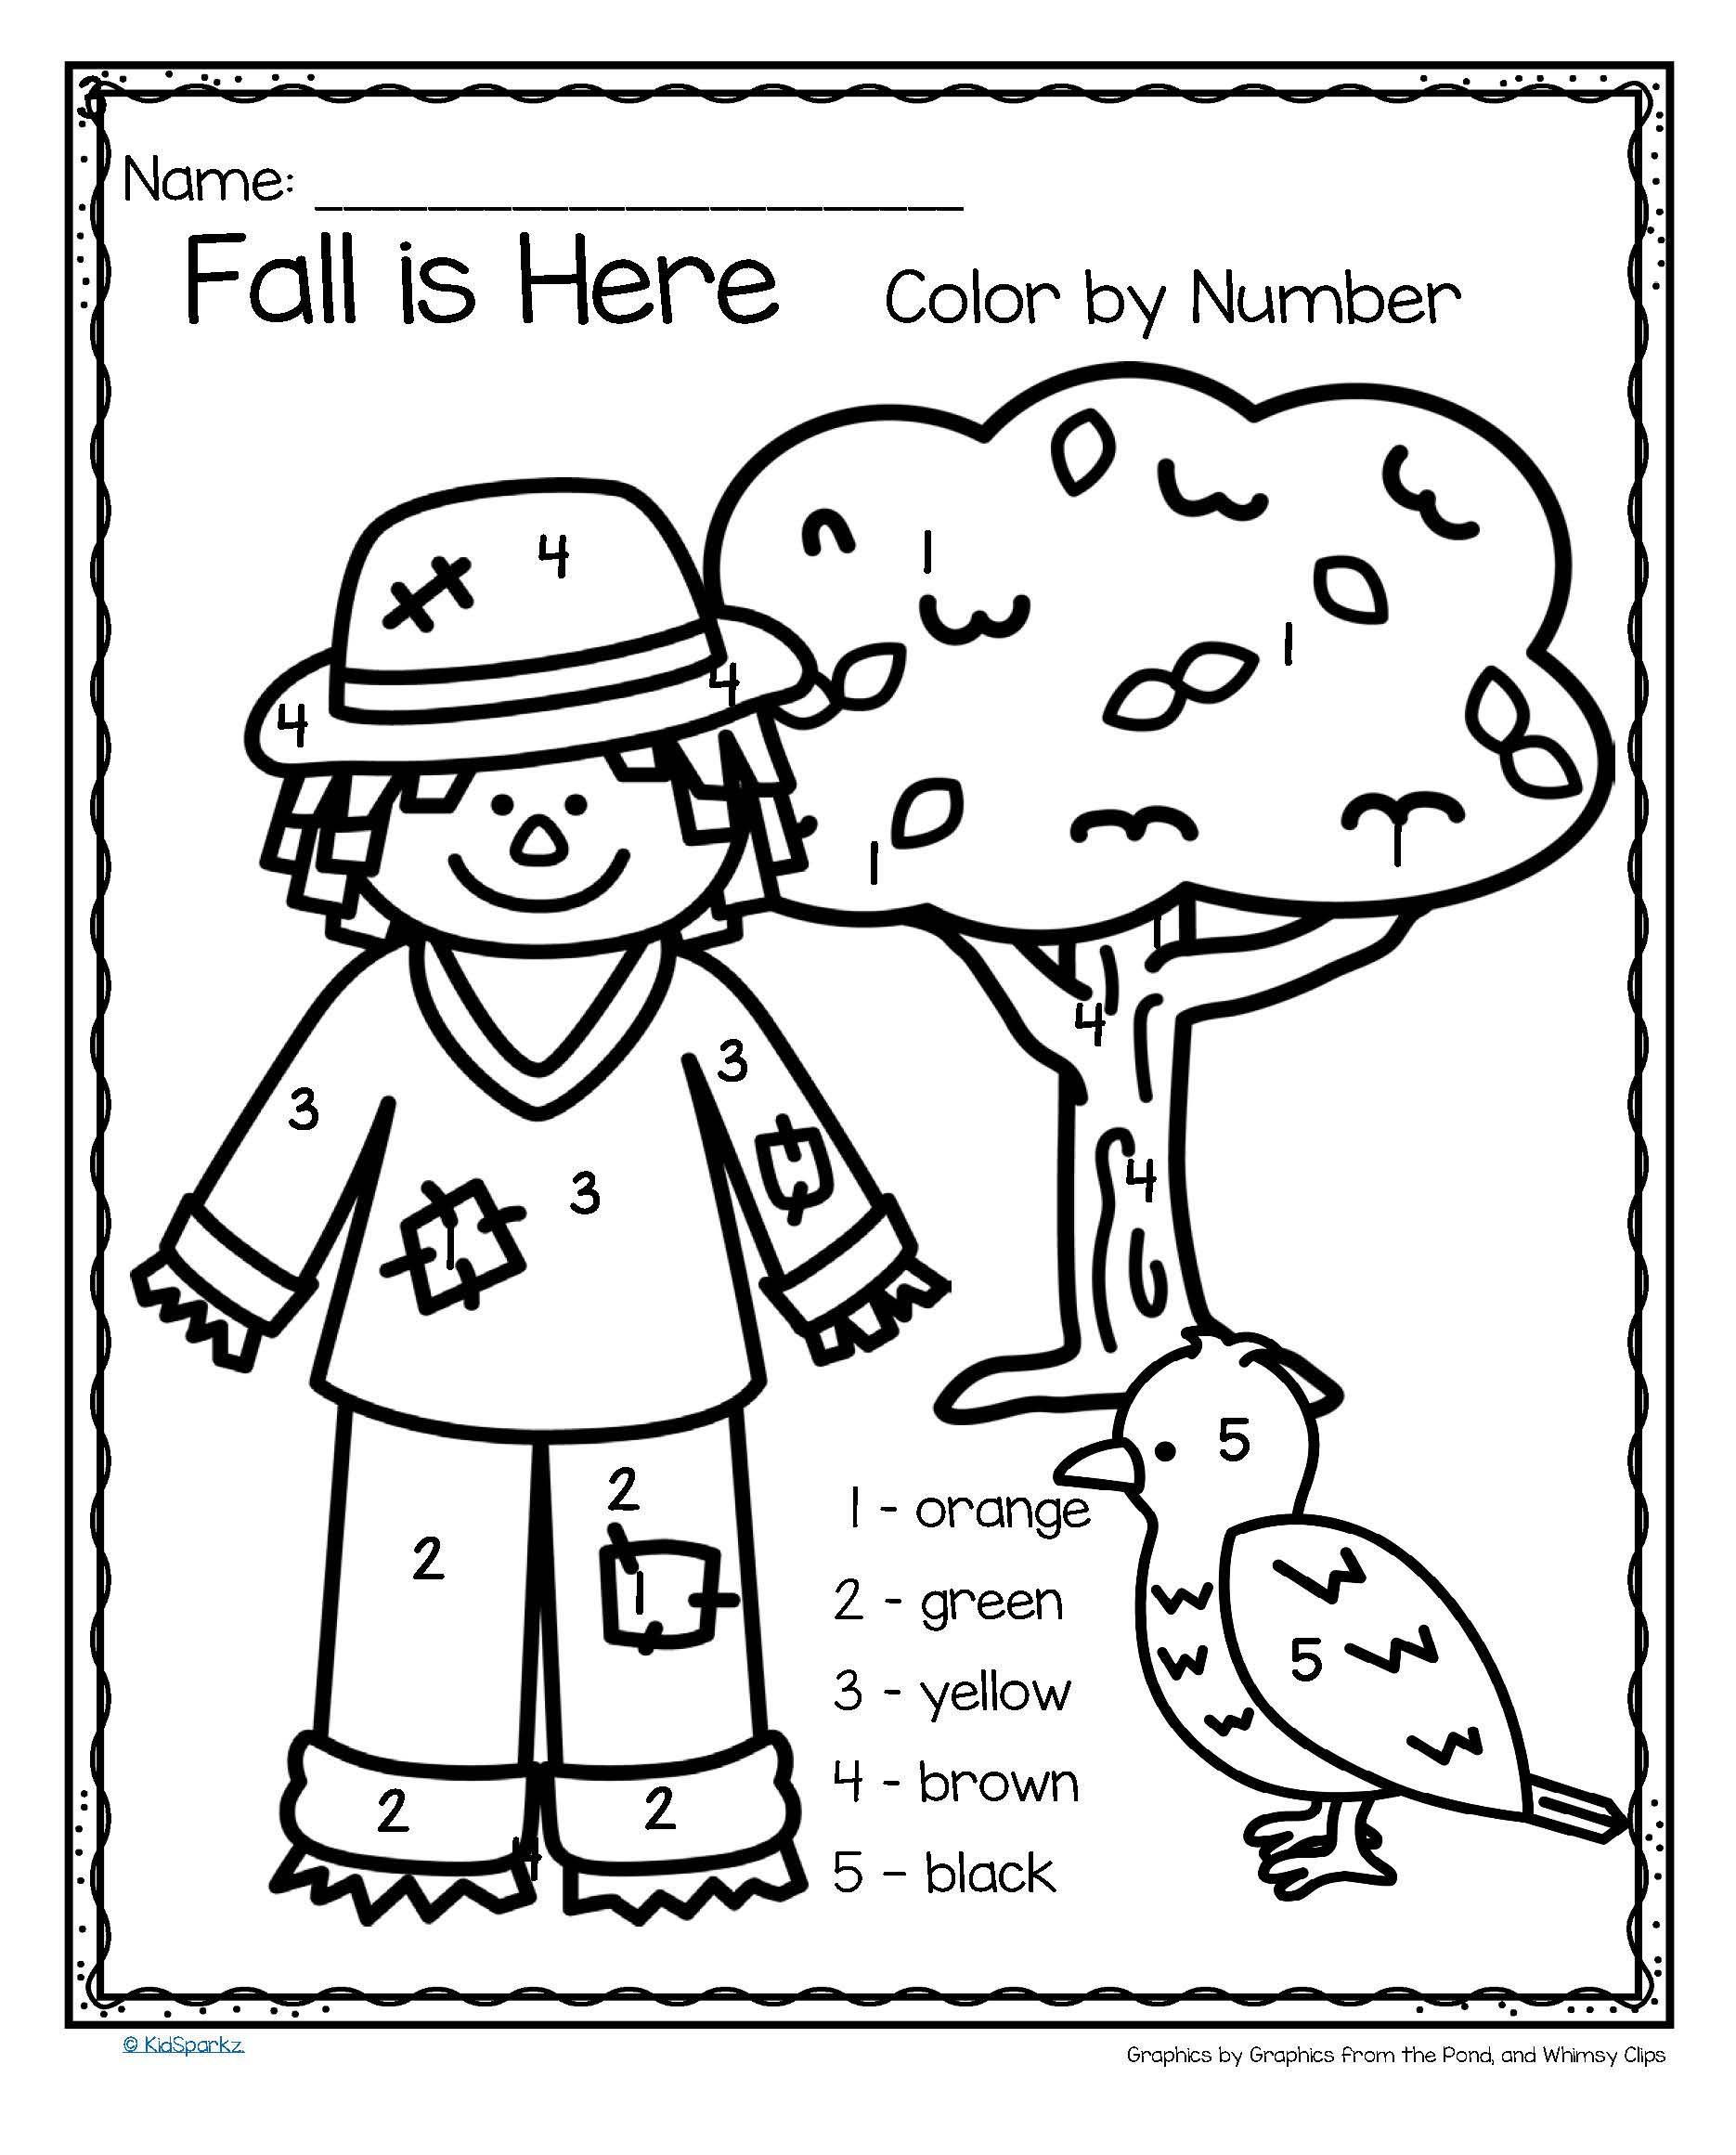 Free Printable Color By Number For Kindergarten